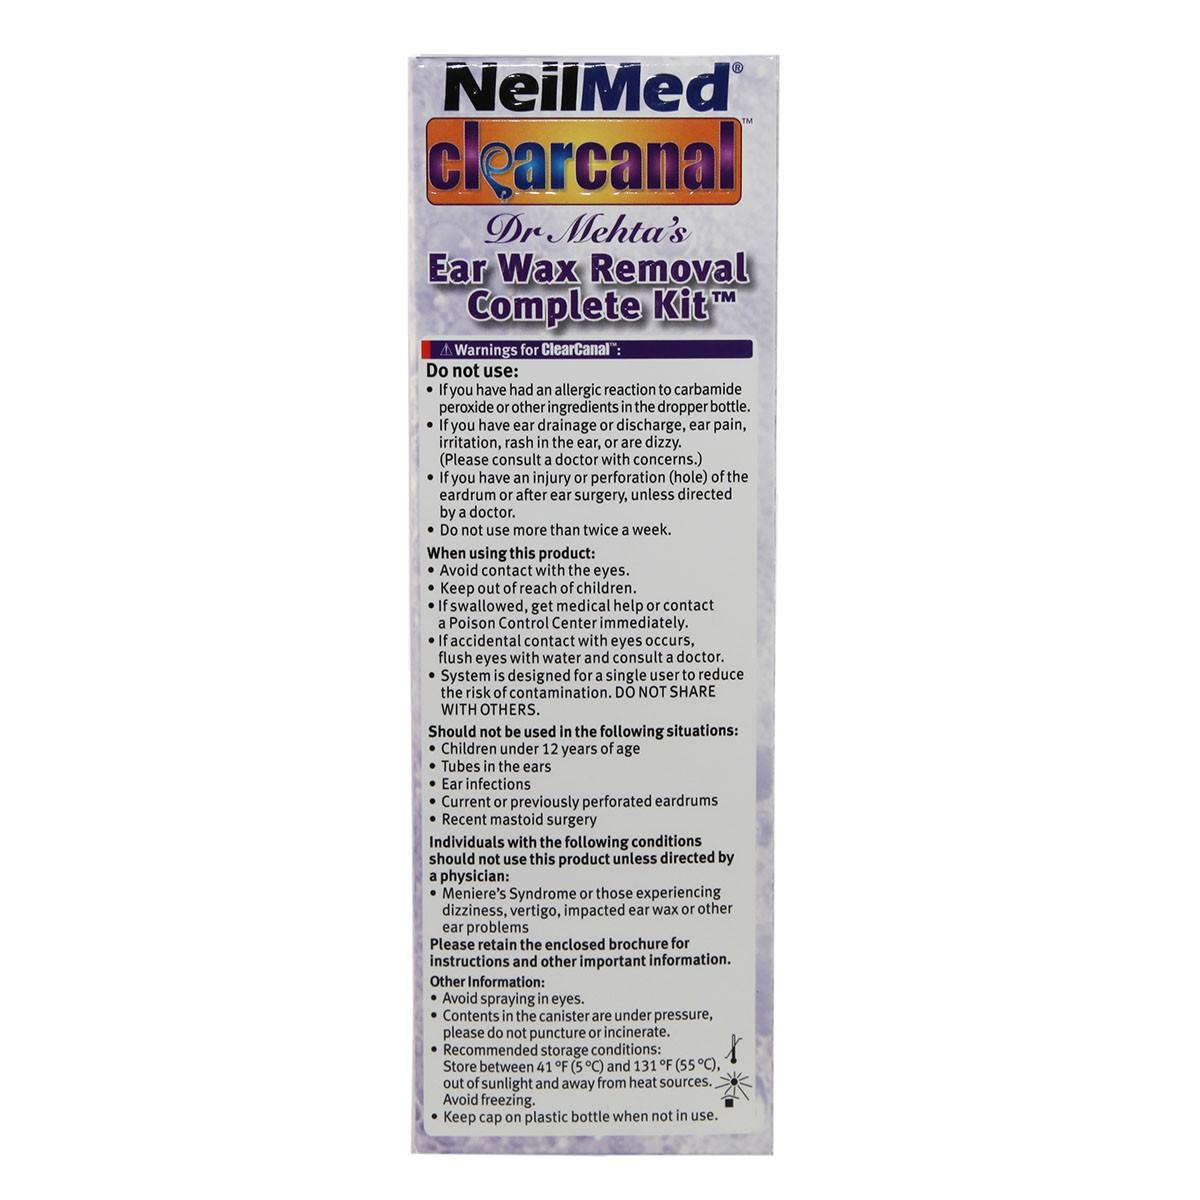 NeilMed ClearCanal Ear Wax Removal Complete Kit